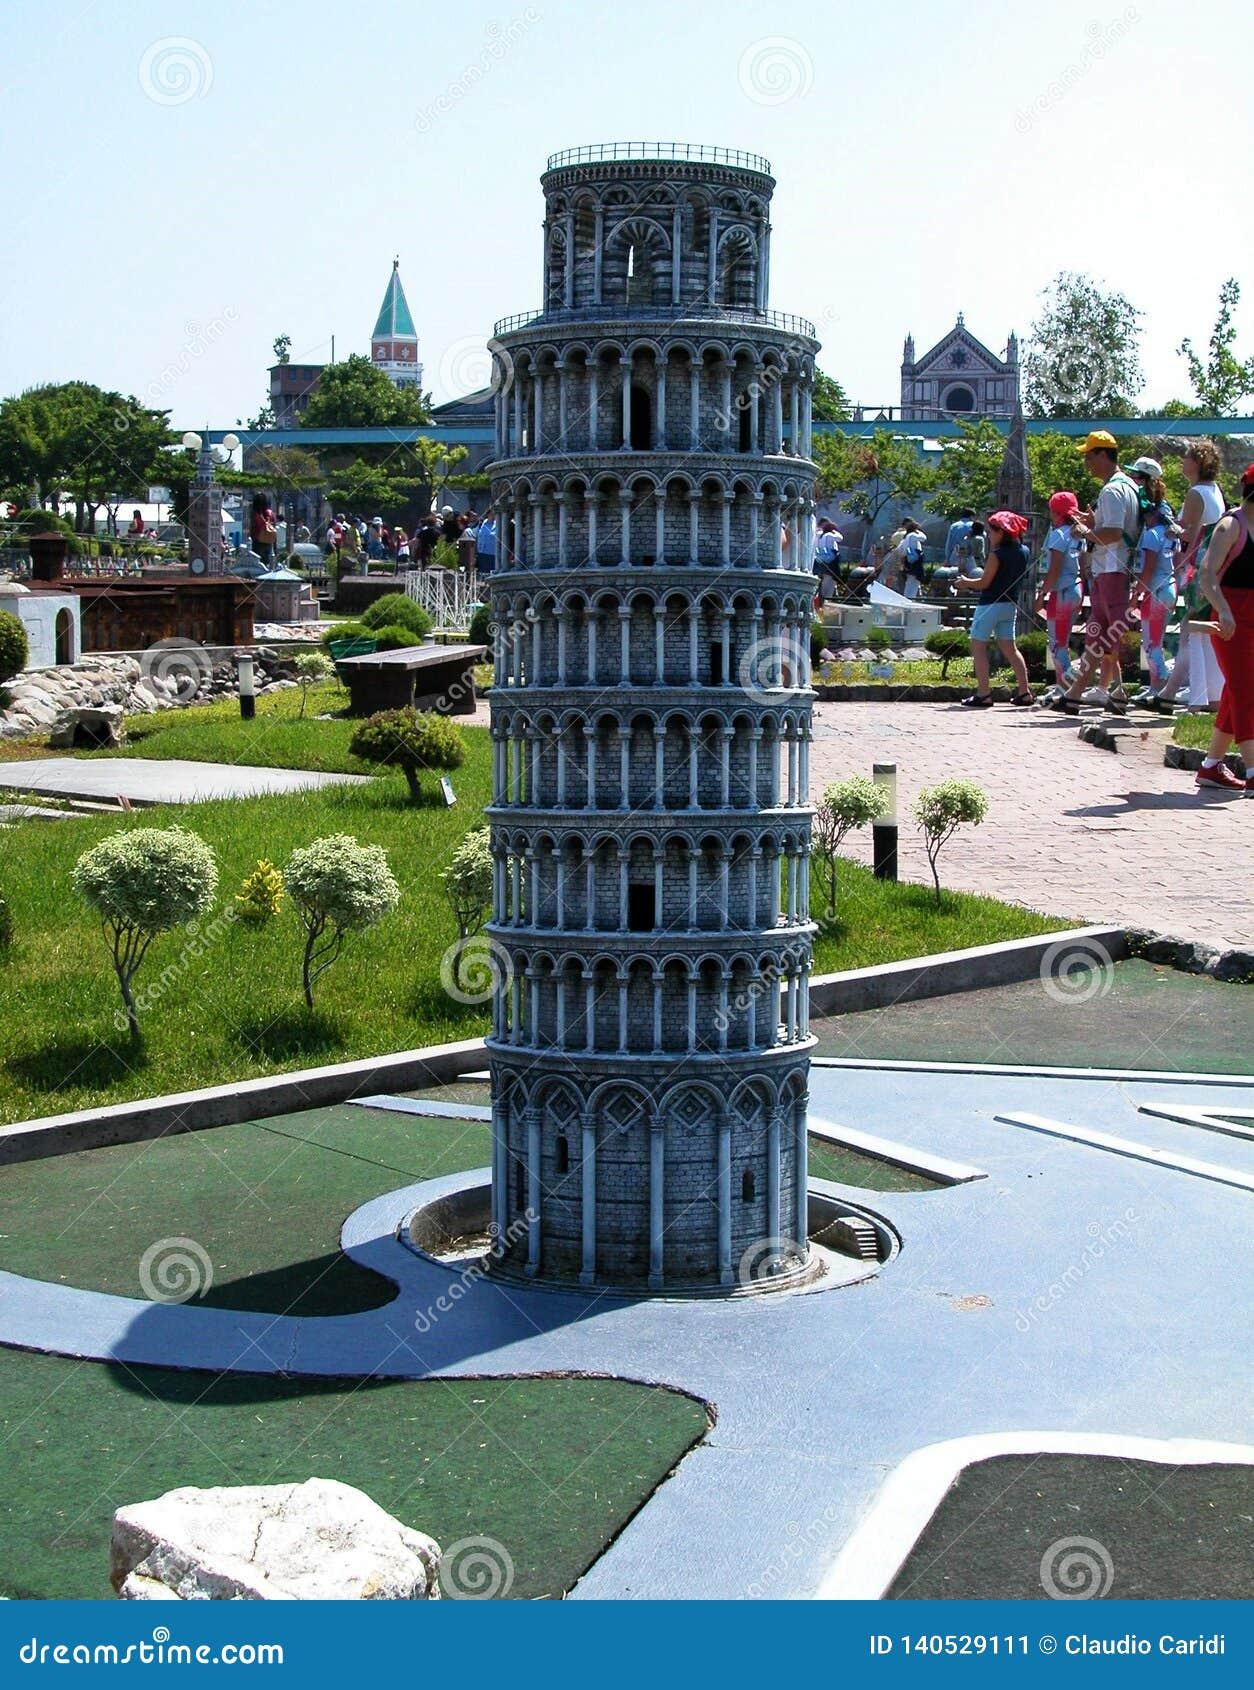 Torre de Pisa en el parque temático 'Italia en la miniatura 'Italia en el miniatura Viserba, Rímini, Italia